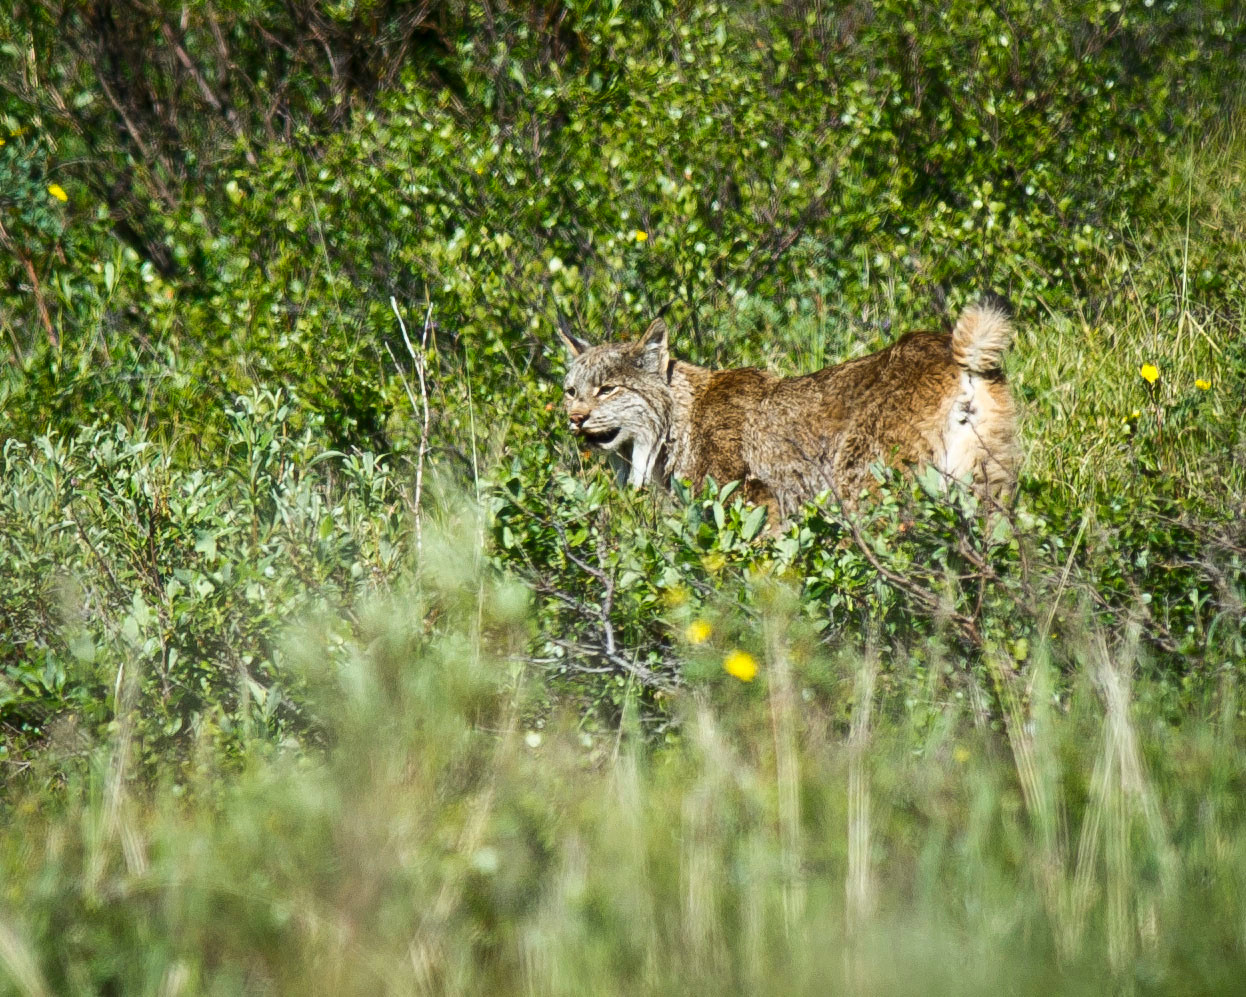 Lynx Denali National Park Denali, Alaska © 2011